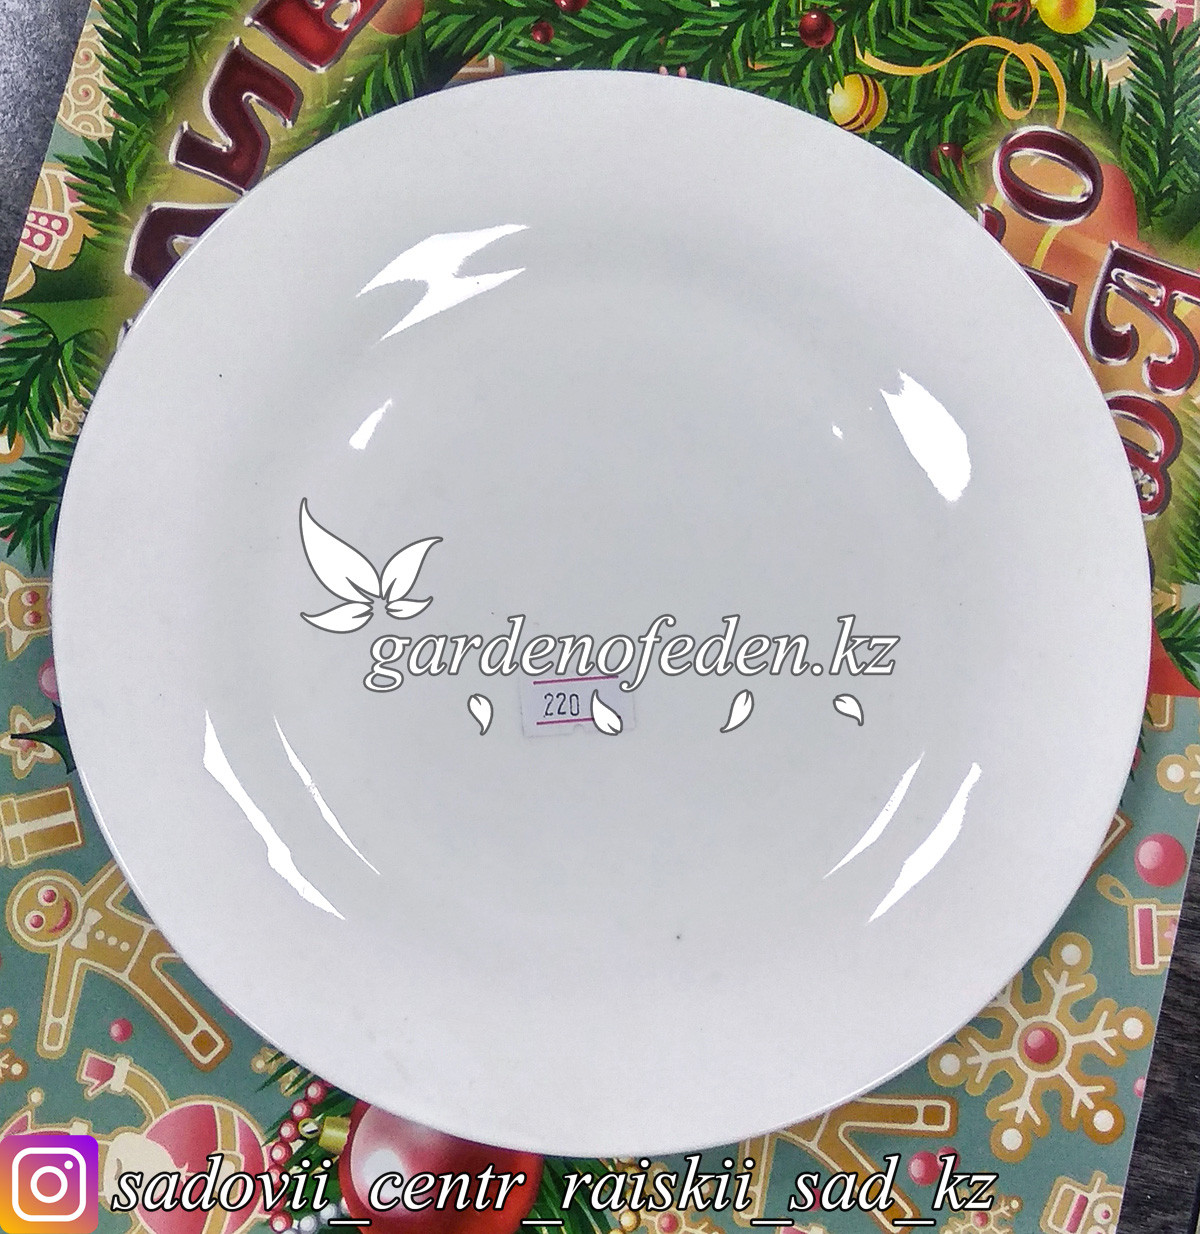 Тарелка обеденная, малая. Цвет: Белый. Материал: Керамика.